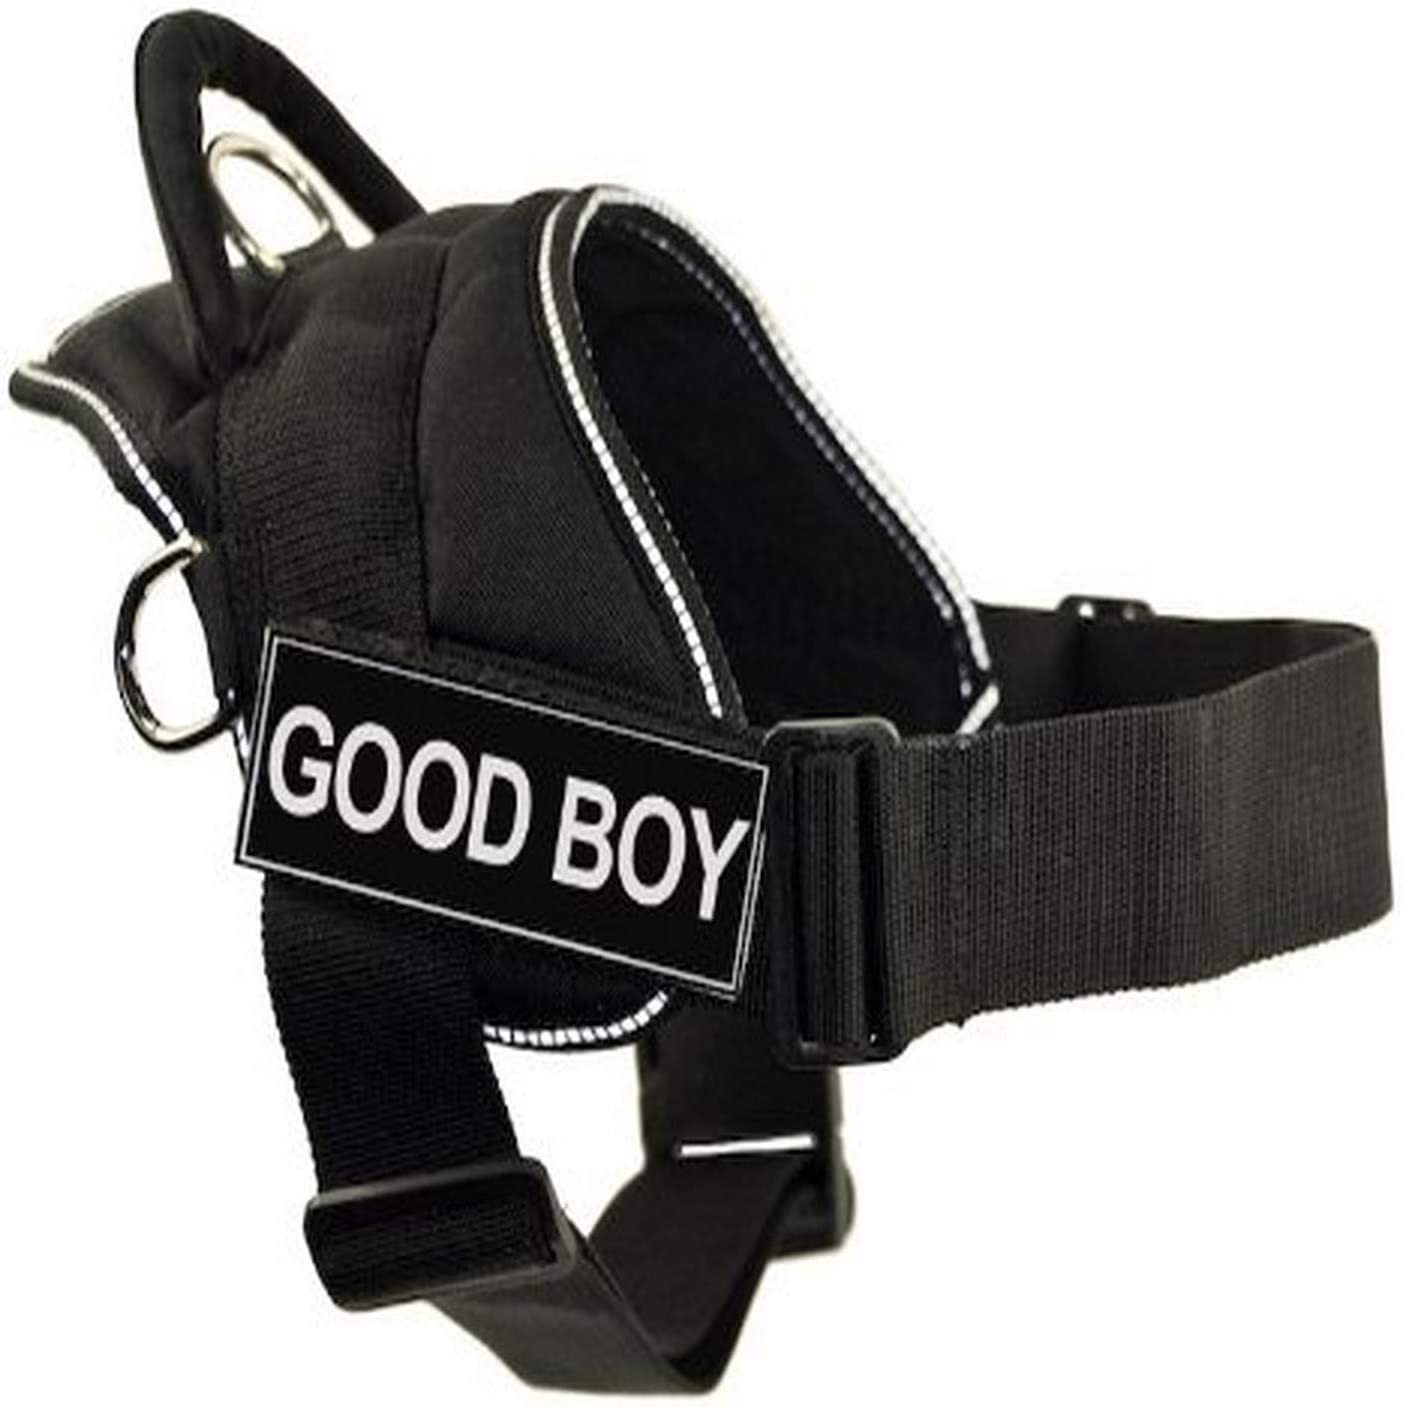 DT Fun Harness Good price Boy Black X-Small With Phoenix Mall - Reflective Trim